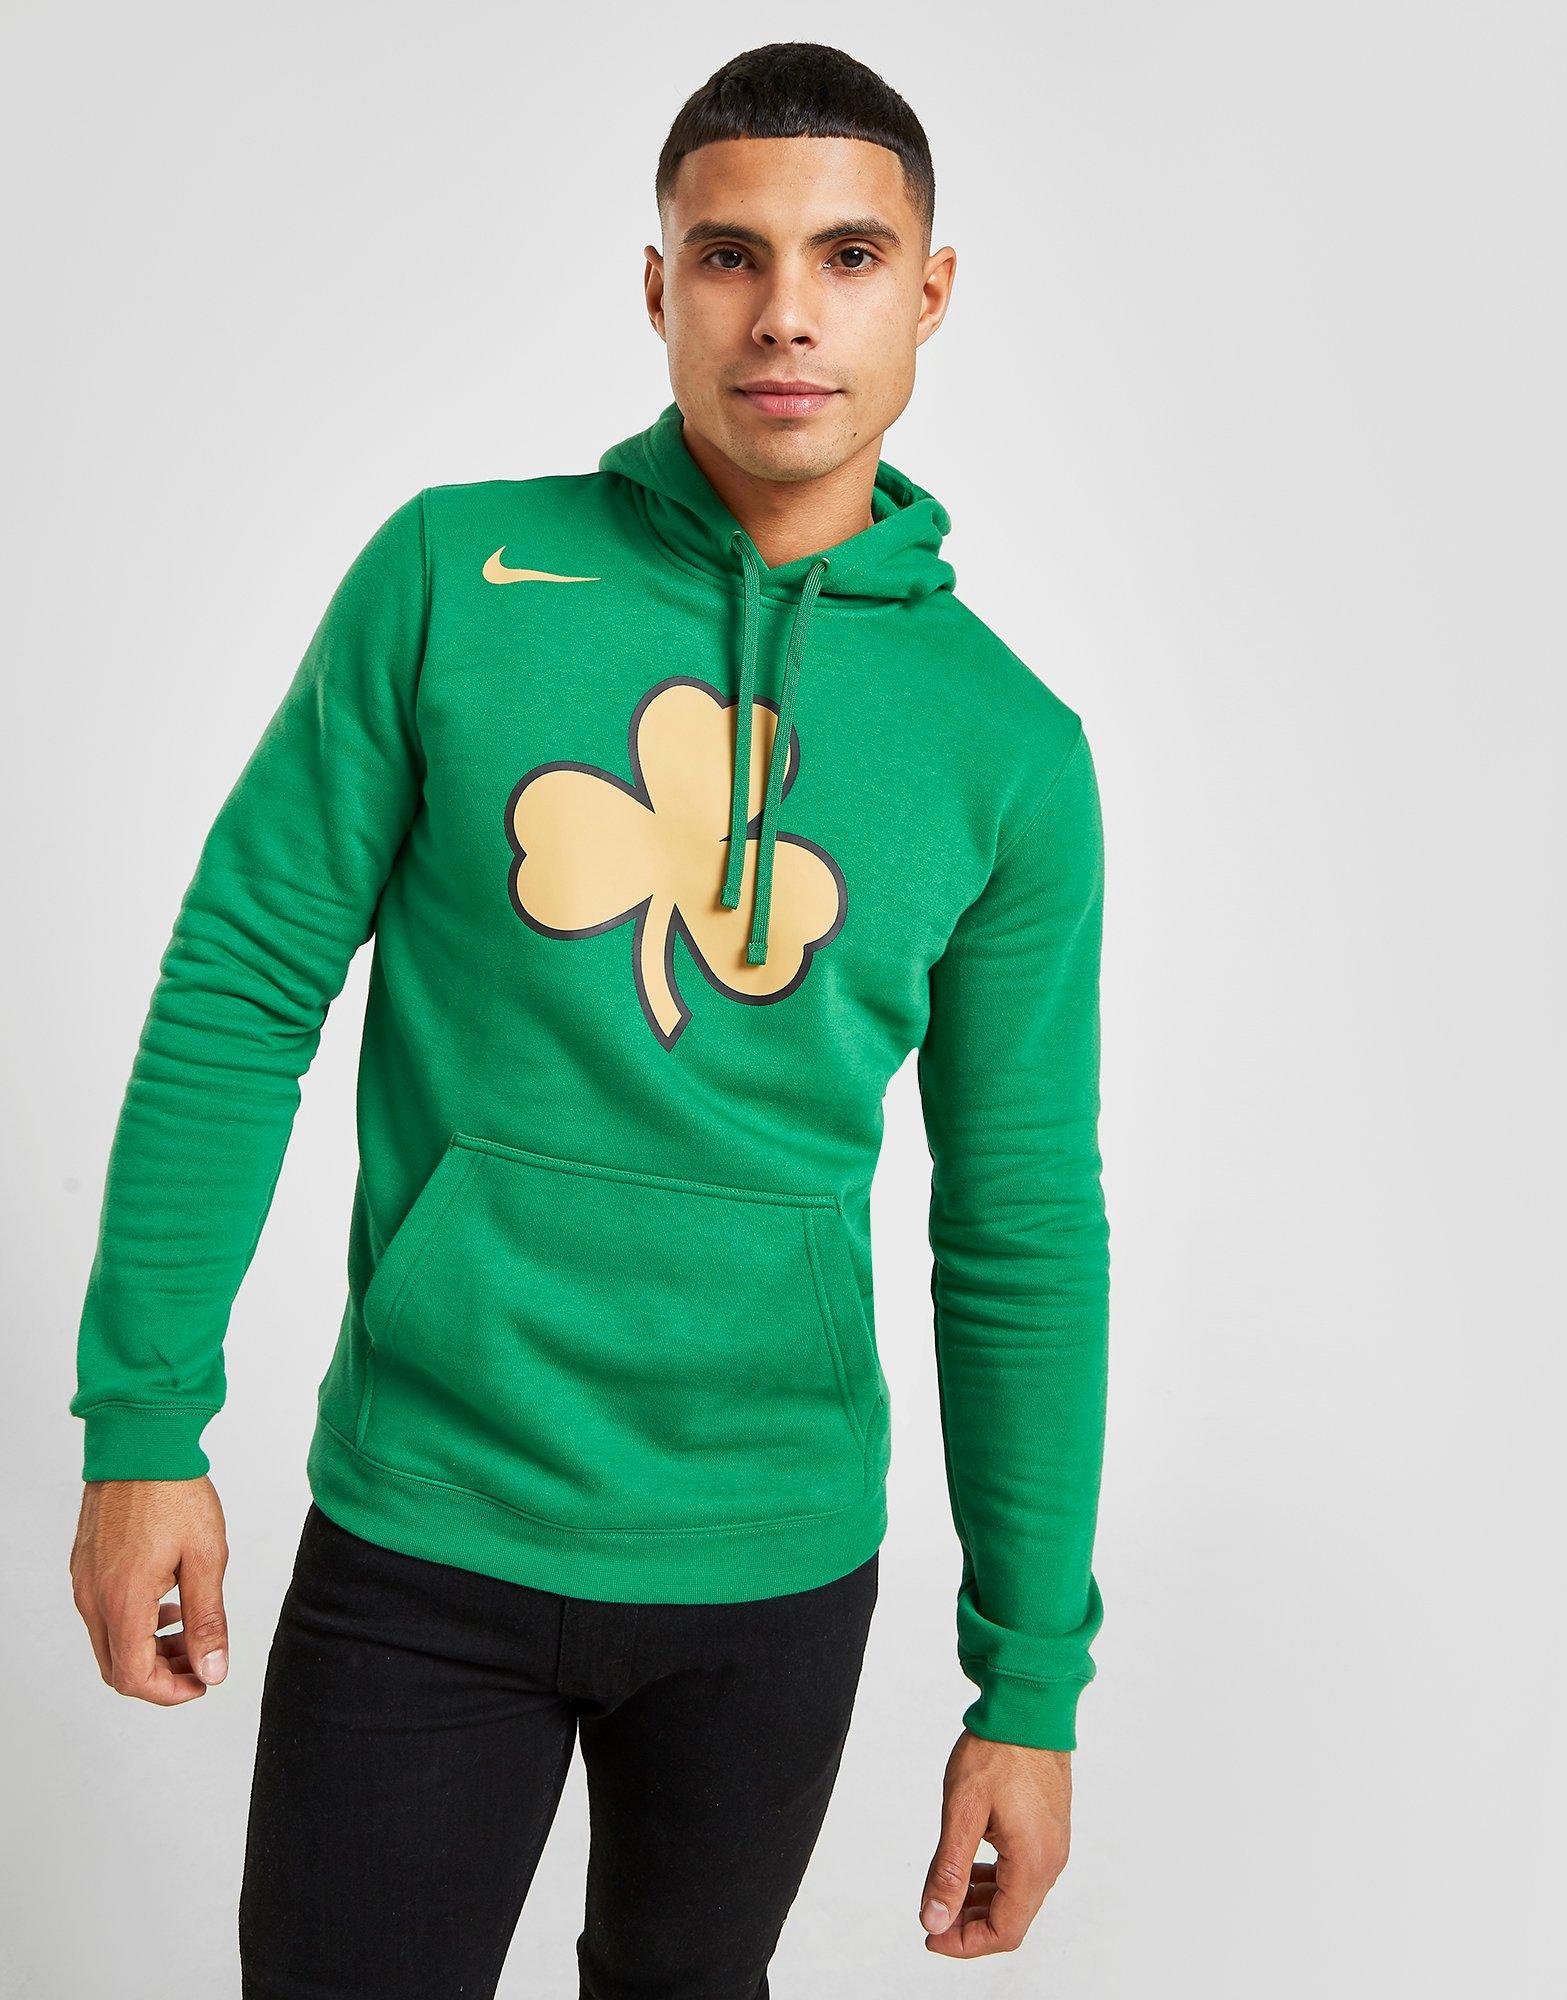 celtics city edition sweatshirt